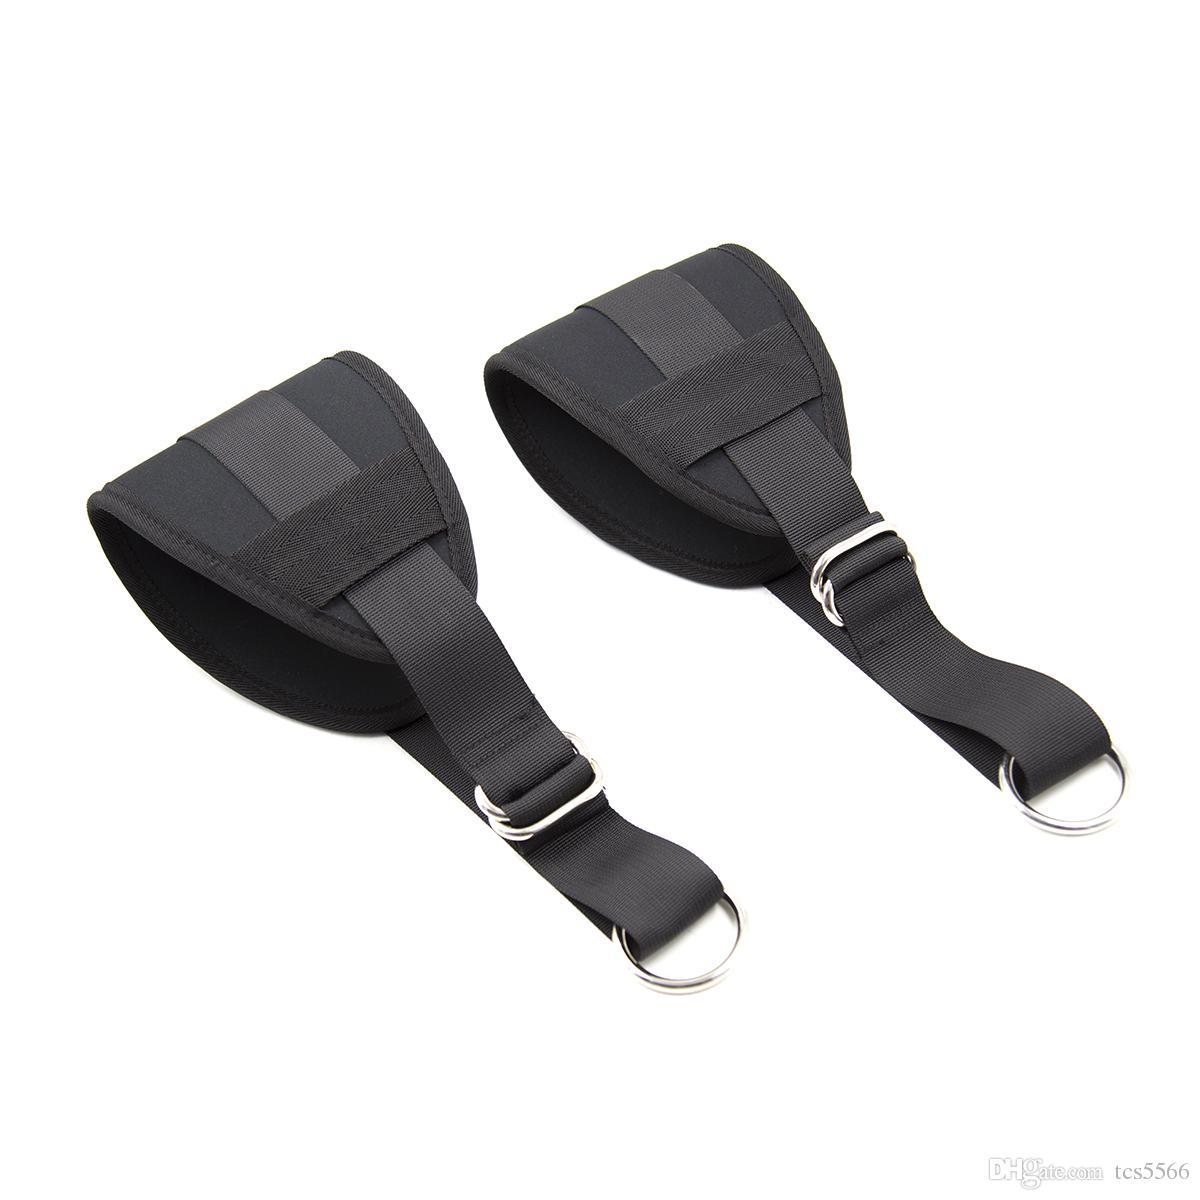 Adult Sex Toys Paar Kit Bondage Open Leg Restraint Harness Sex Kombination Gürtel Sexuelle Position Bondage